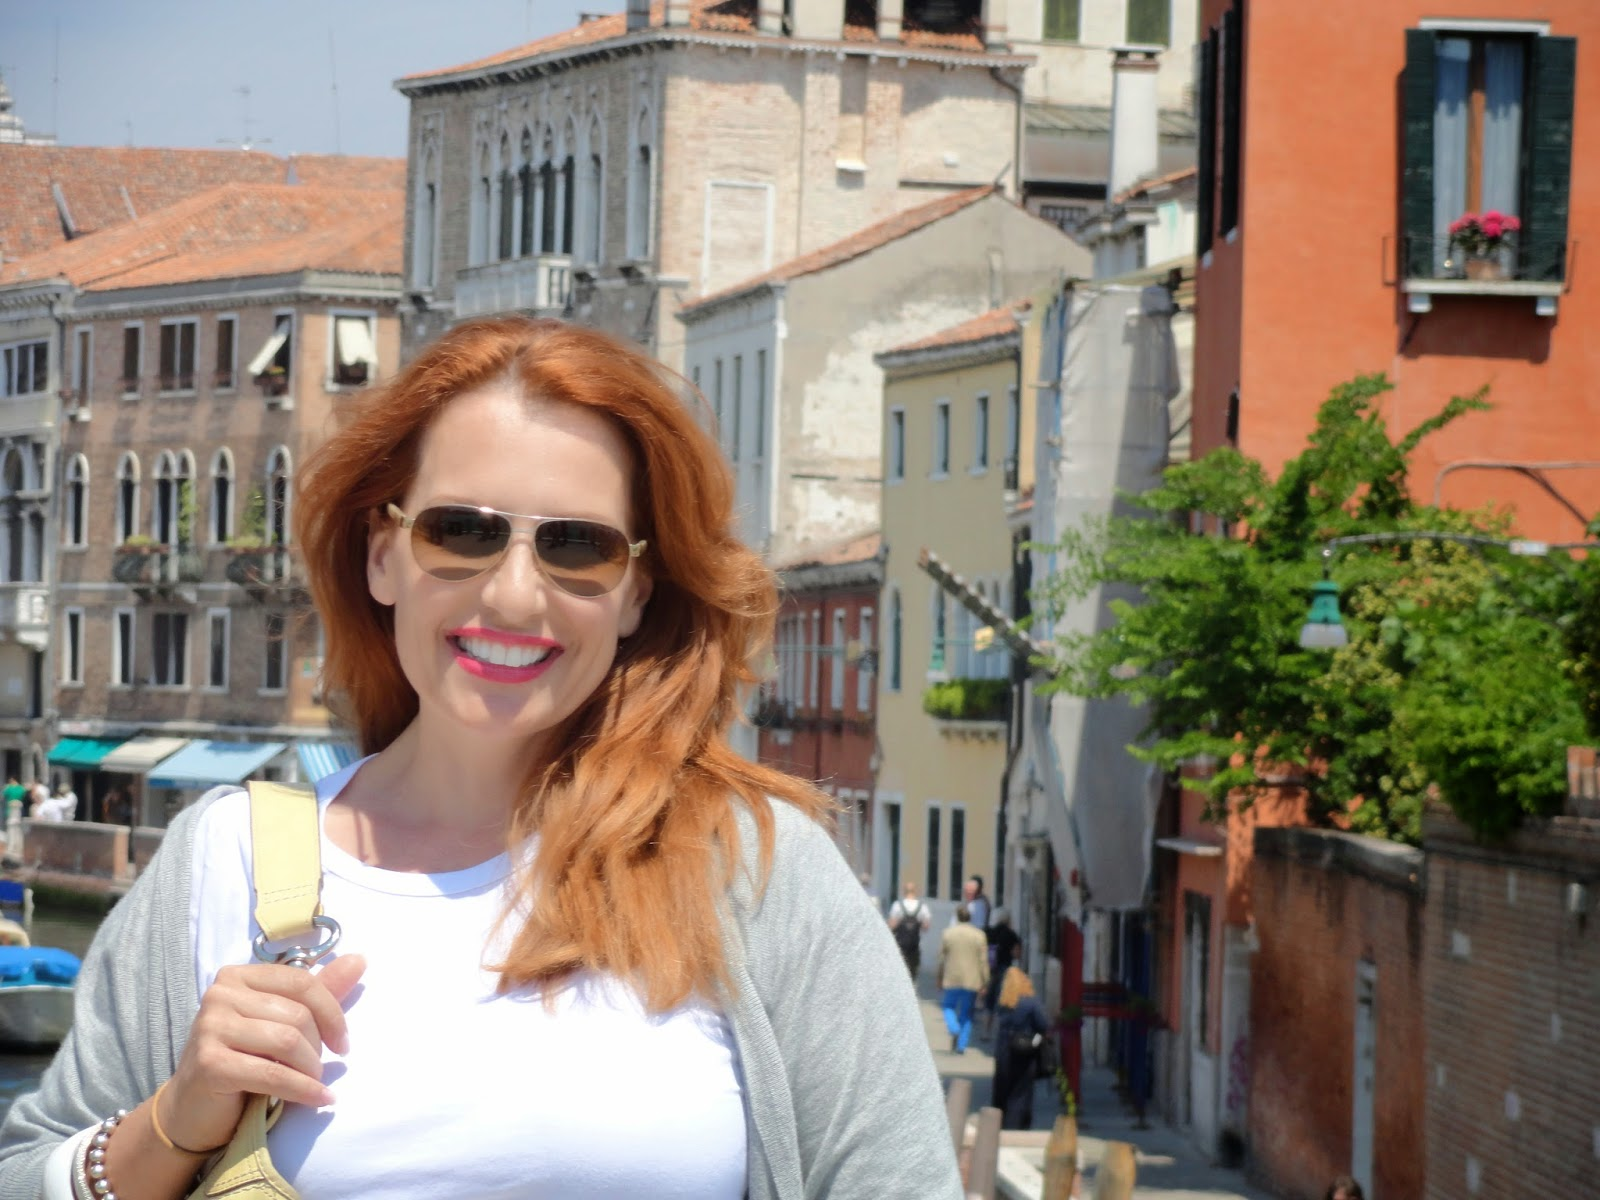 Corinna-B-In-Venice-Get-Lost-In-Venice